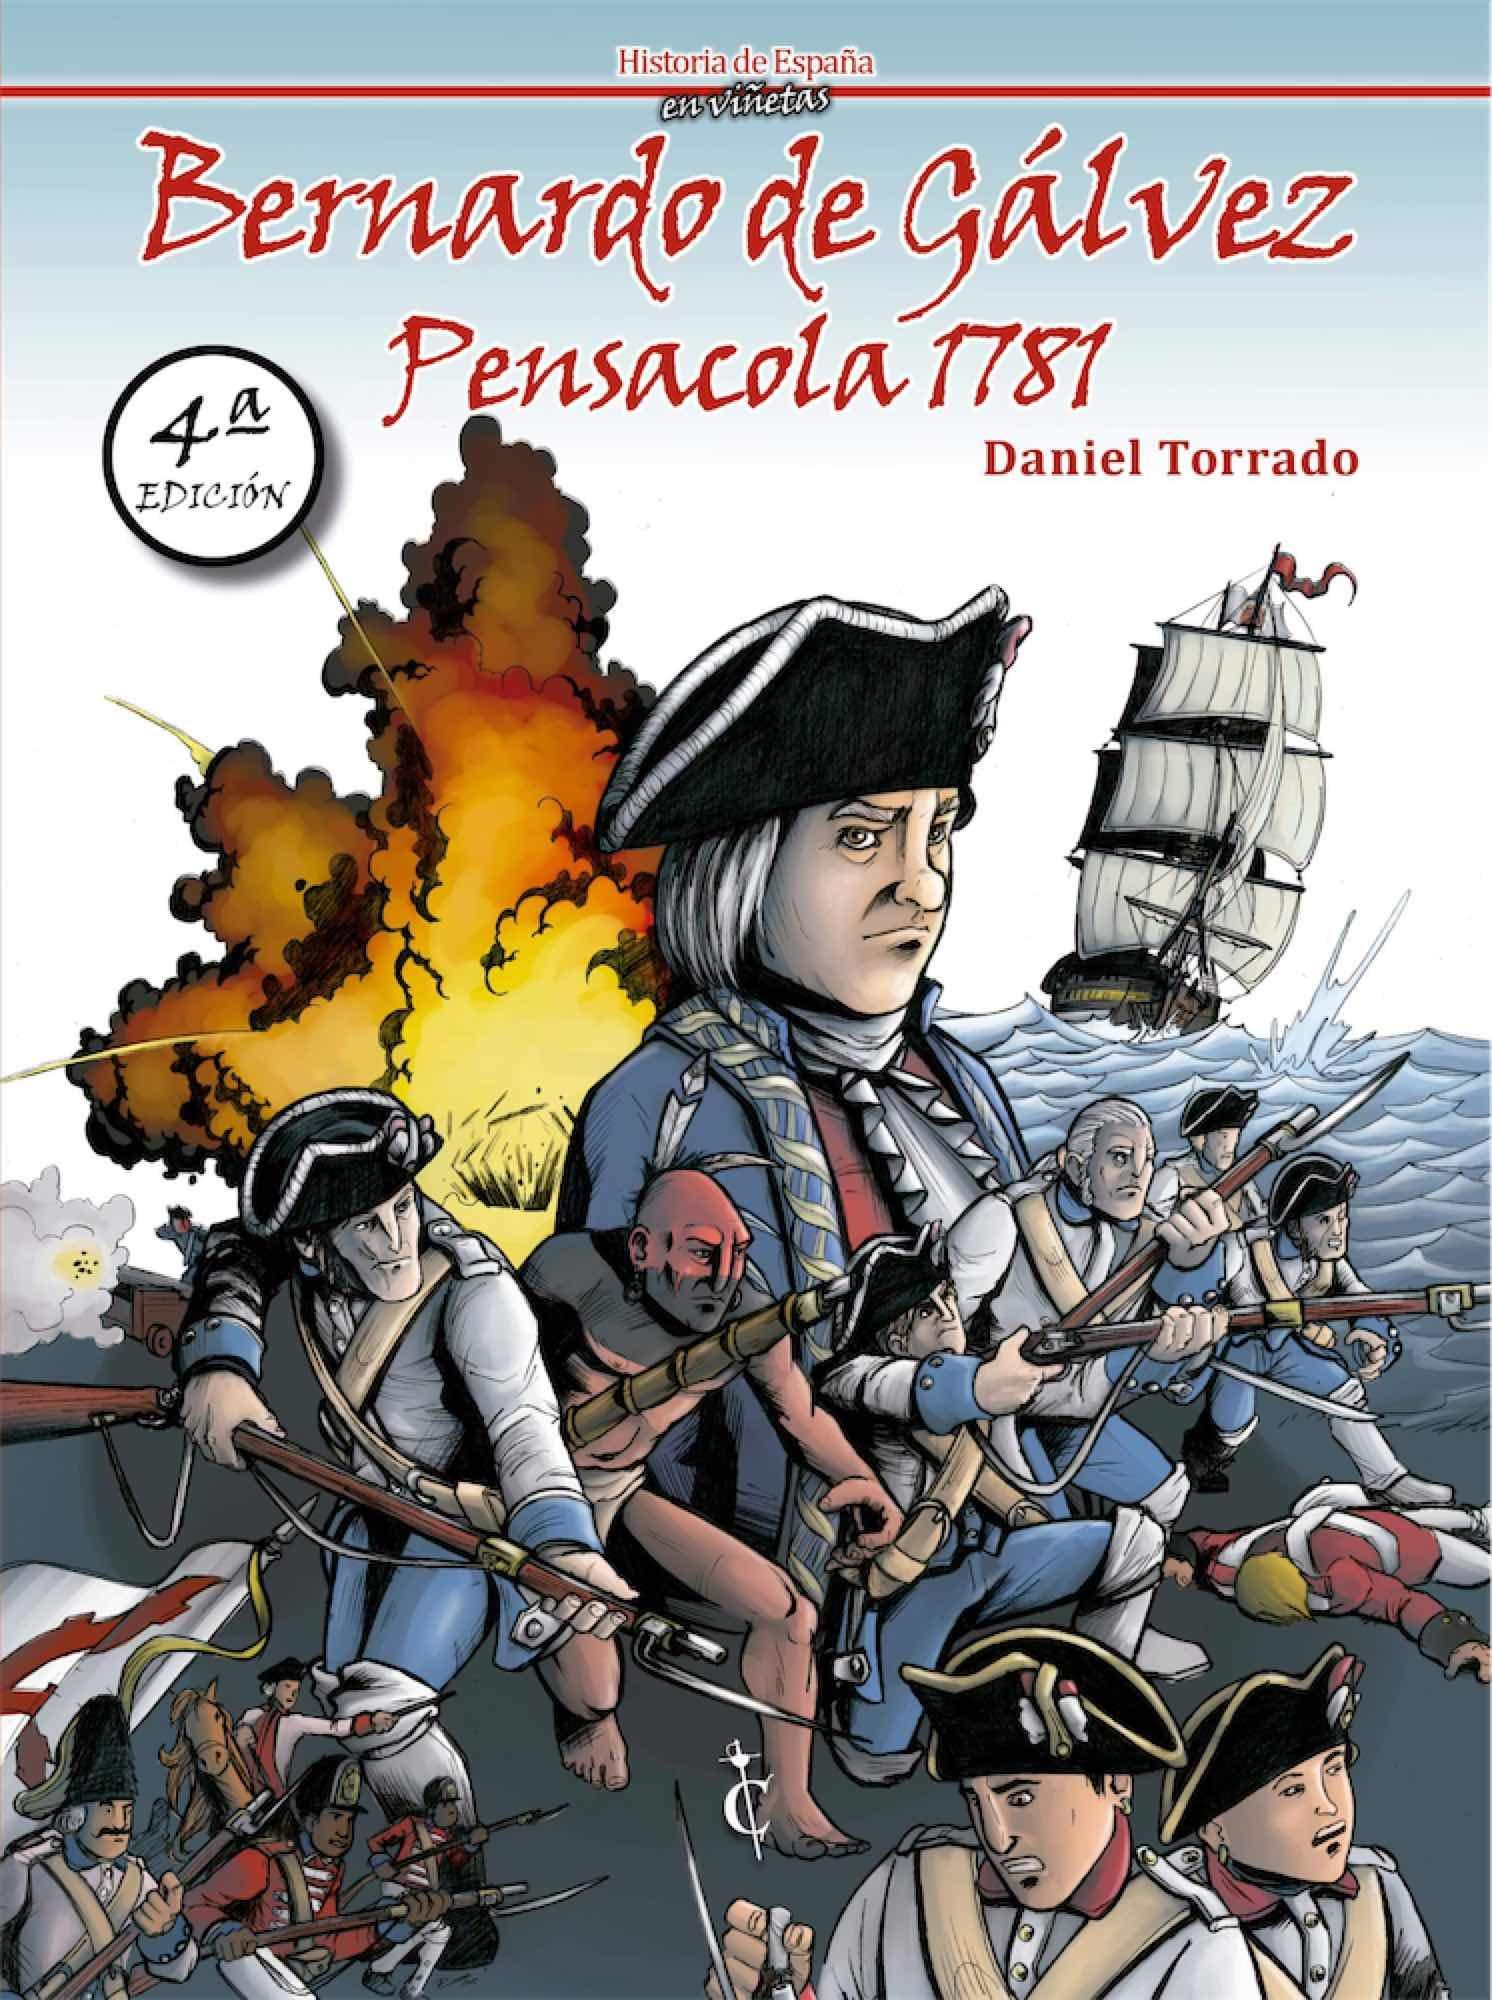 Bernardo De Galvez, Pensacola 1781: Amazon.es: Daniel Torrado, Daniel Torrado: Libros